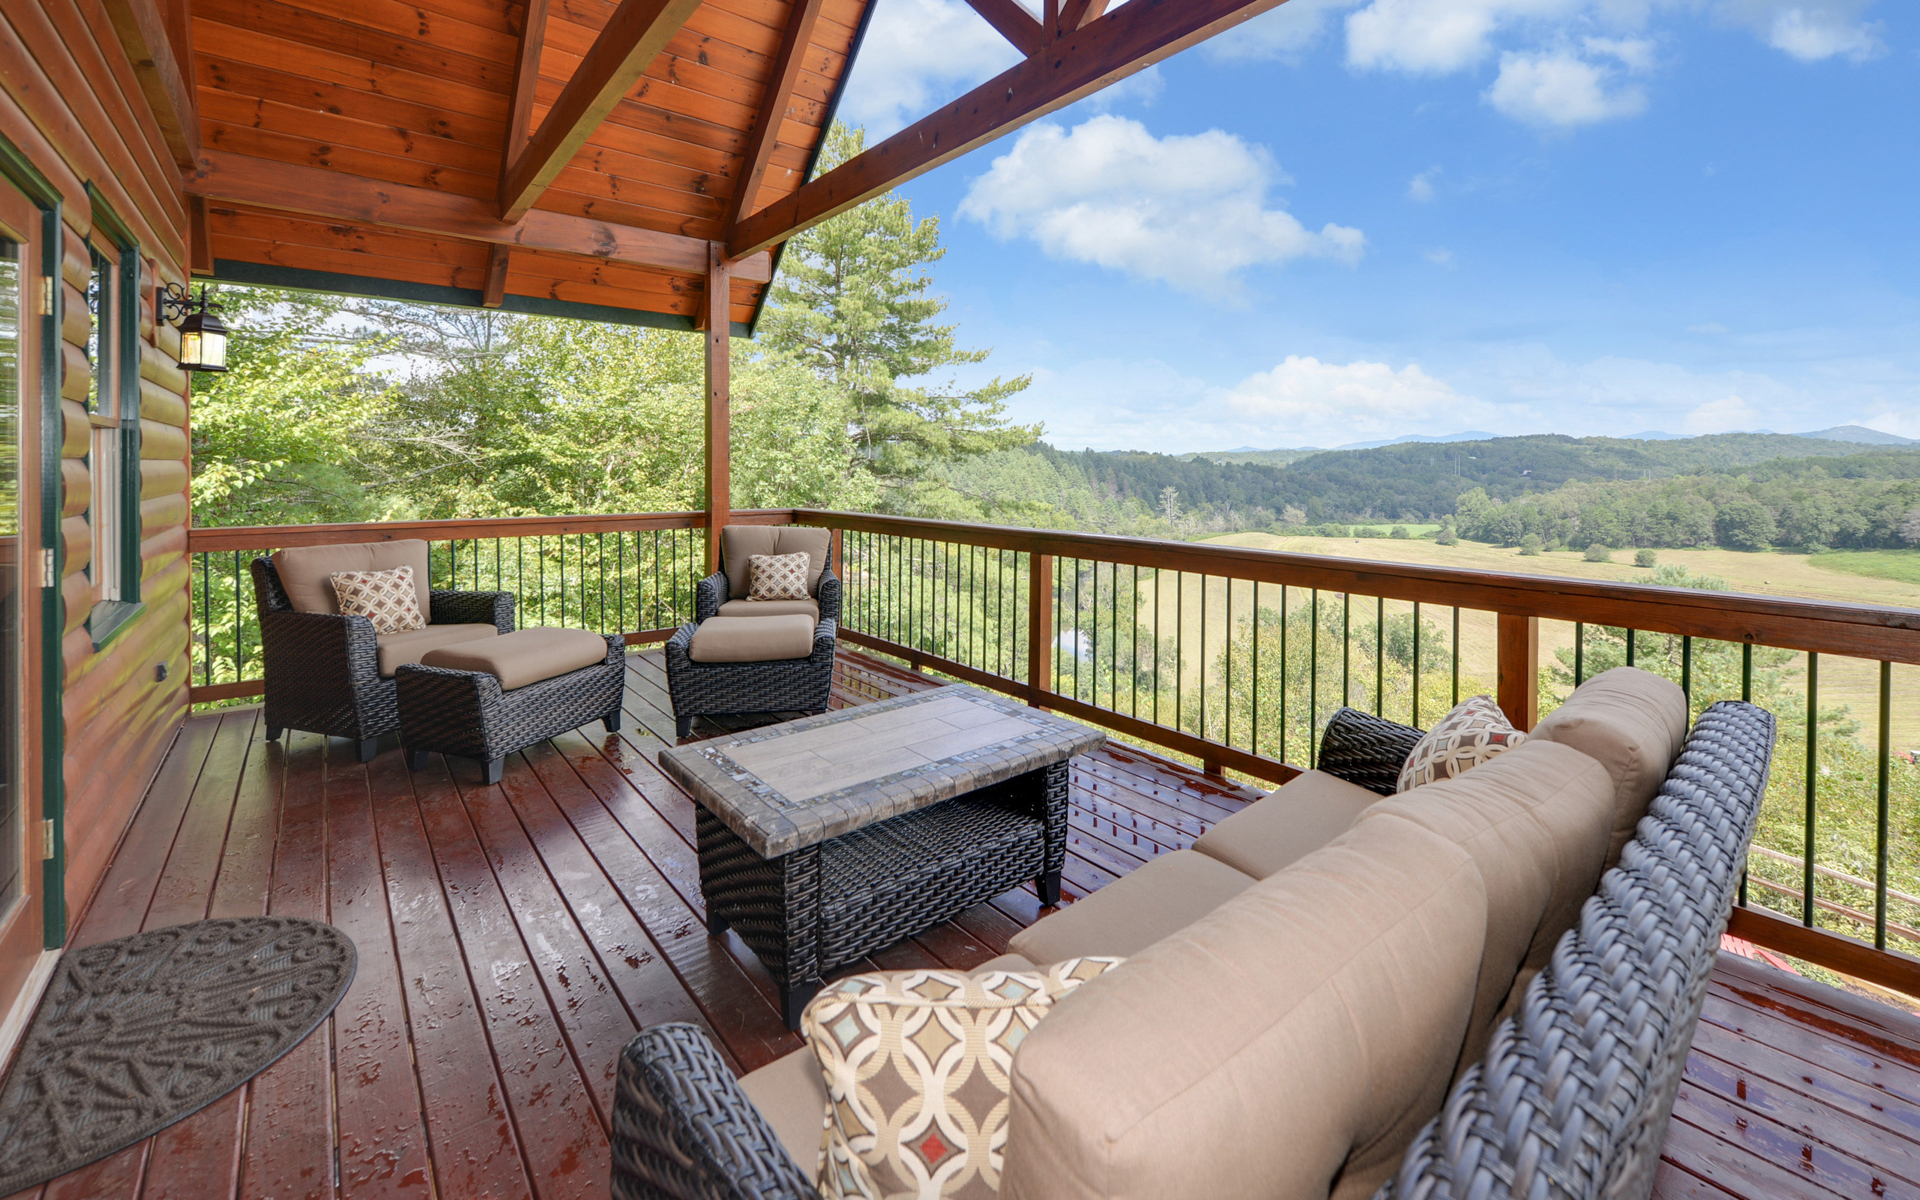 The Toccoa Lodge Blue Ridge Vacation Rental